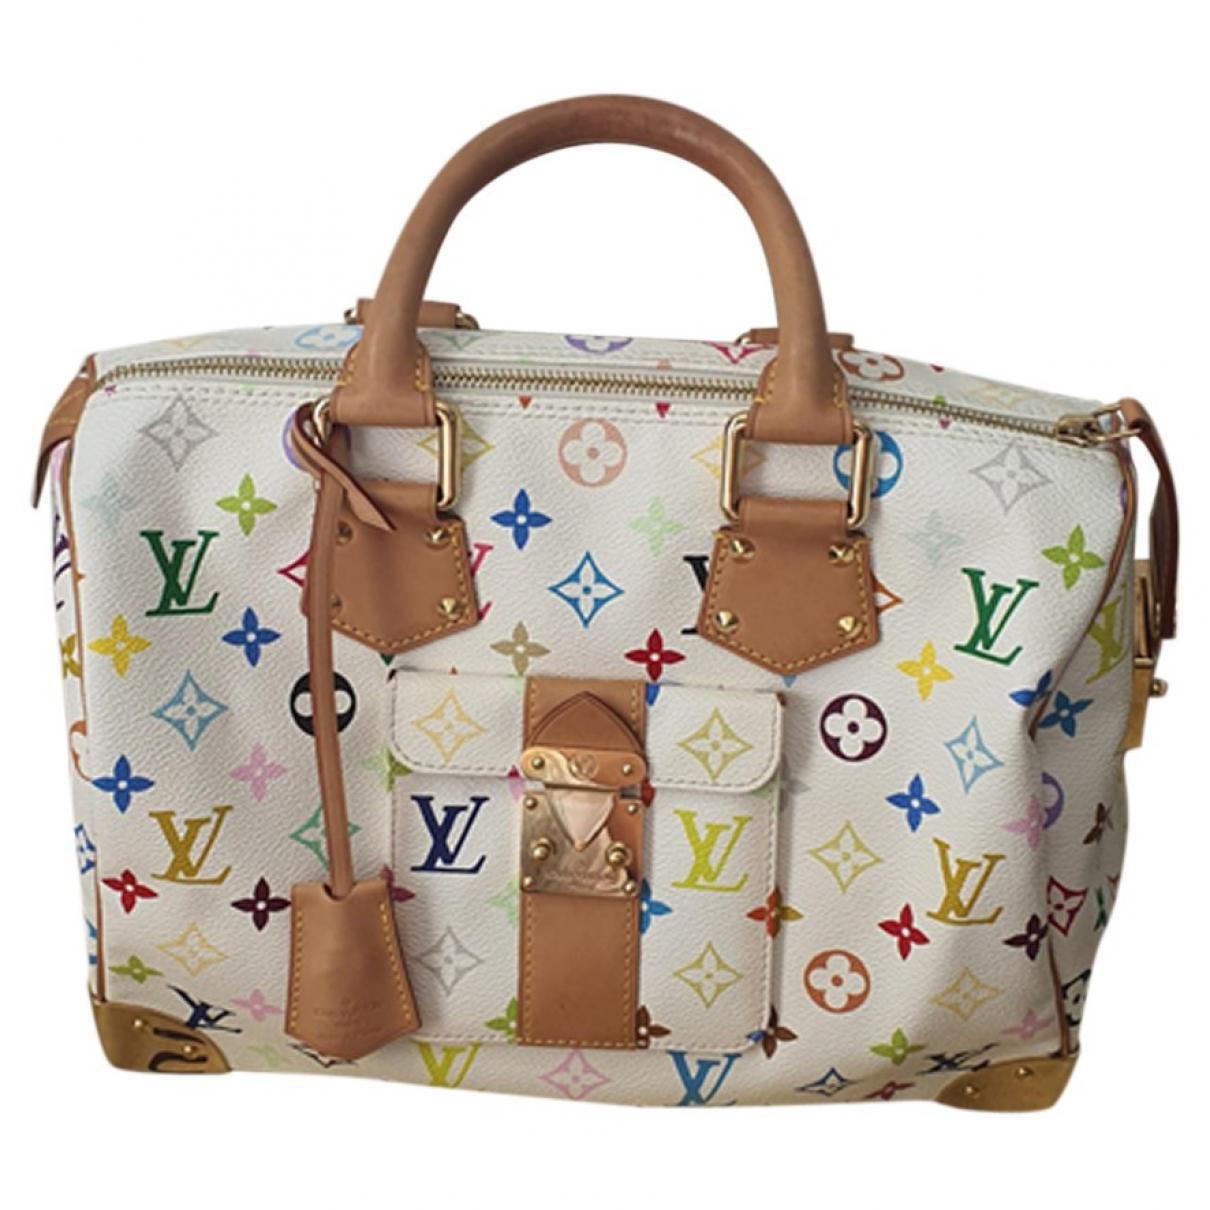 Louis Vuitton Speedy Multicolour Cloth handbag for Women N